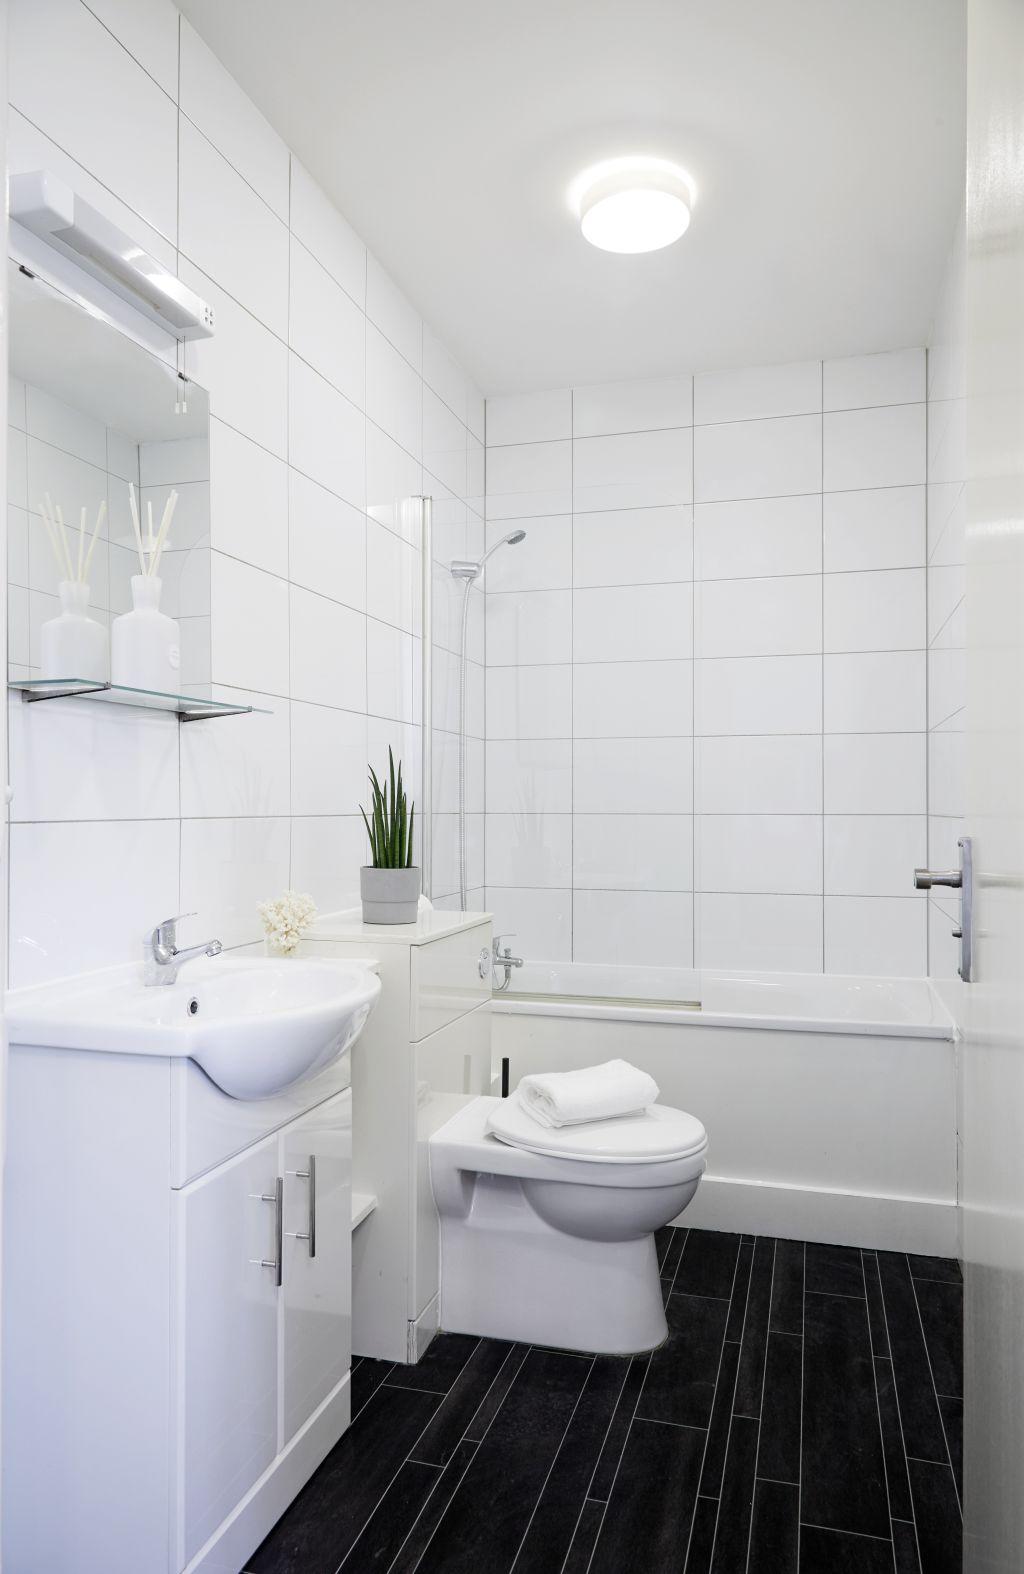 image 8 furnished 1 bedroom Apartment for rent in Watford, Hertfordshire